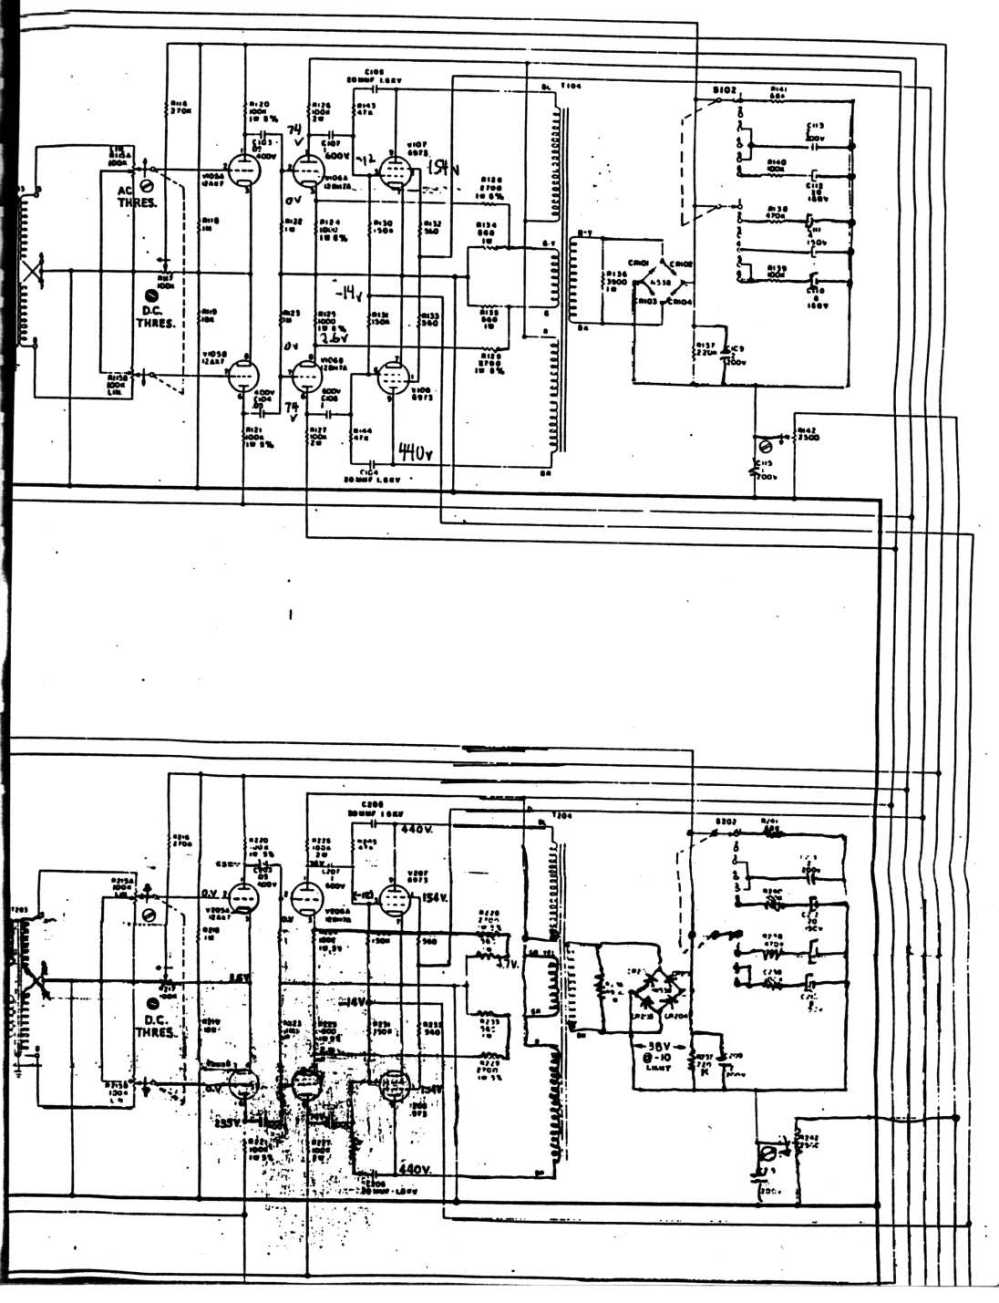 medium resolution of fisher k 10 spacexpander reverb fisher pr 6 preamplifier genelex basic preamps genelex basic tone controls phono eq genelex tape eq bass treble boost